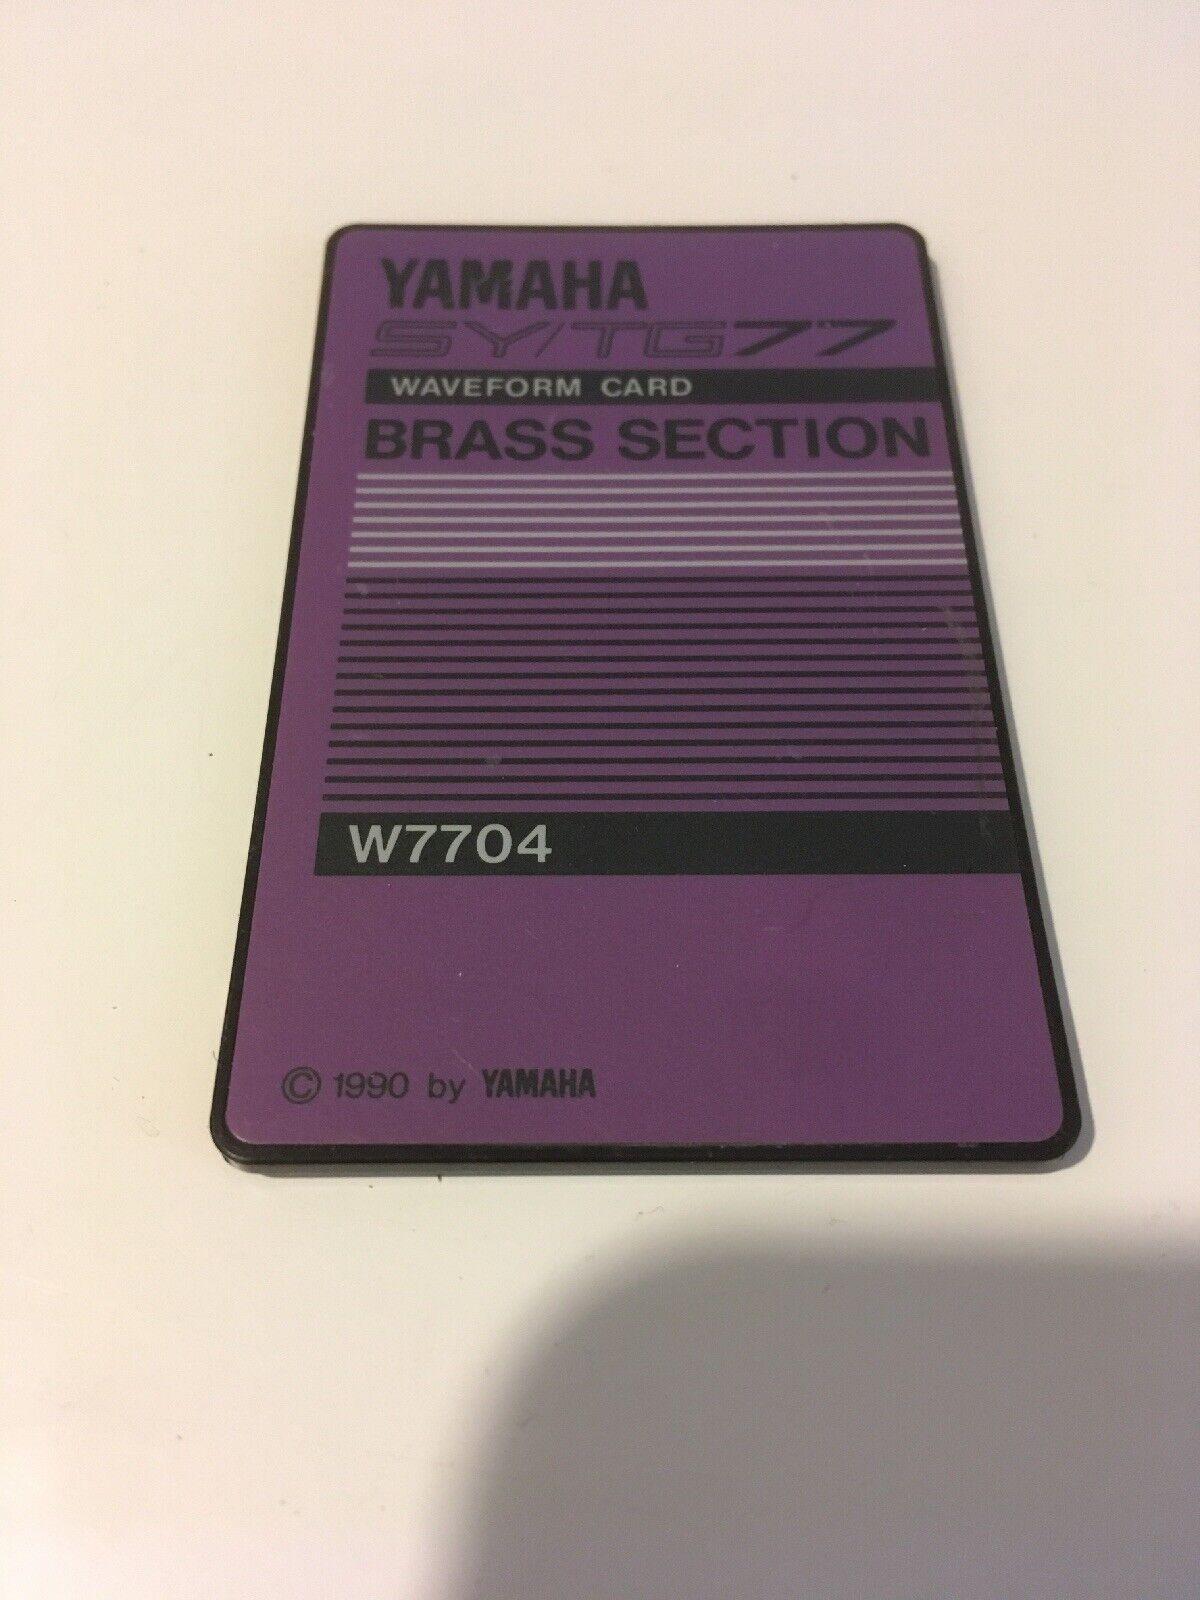 Yamaha SY   TG77 ROM Card - Brass Section